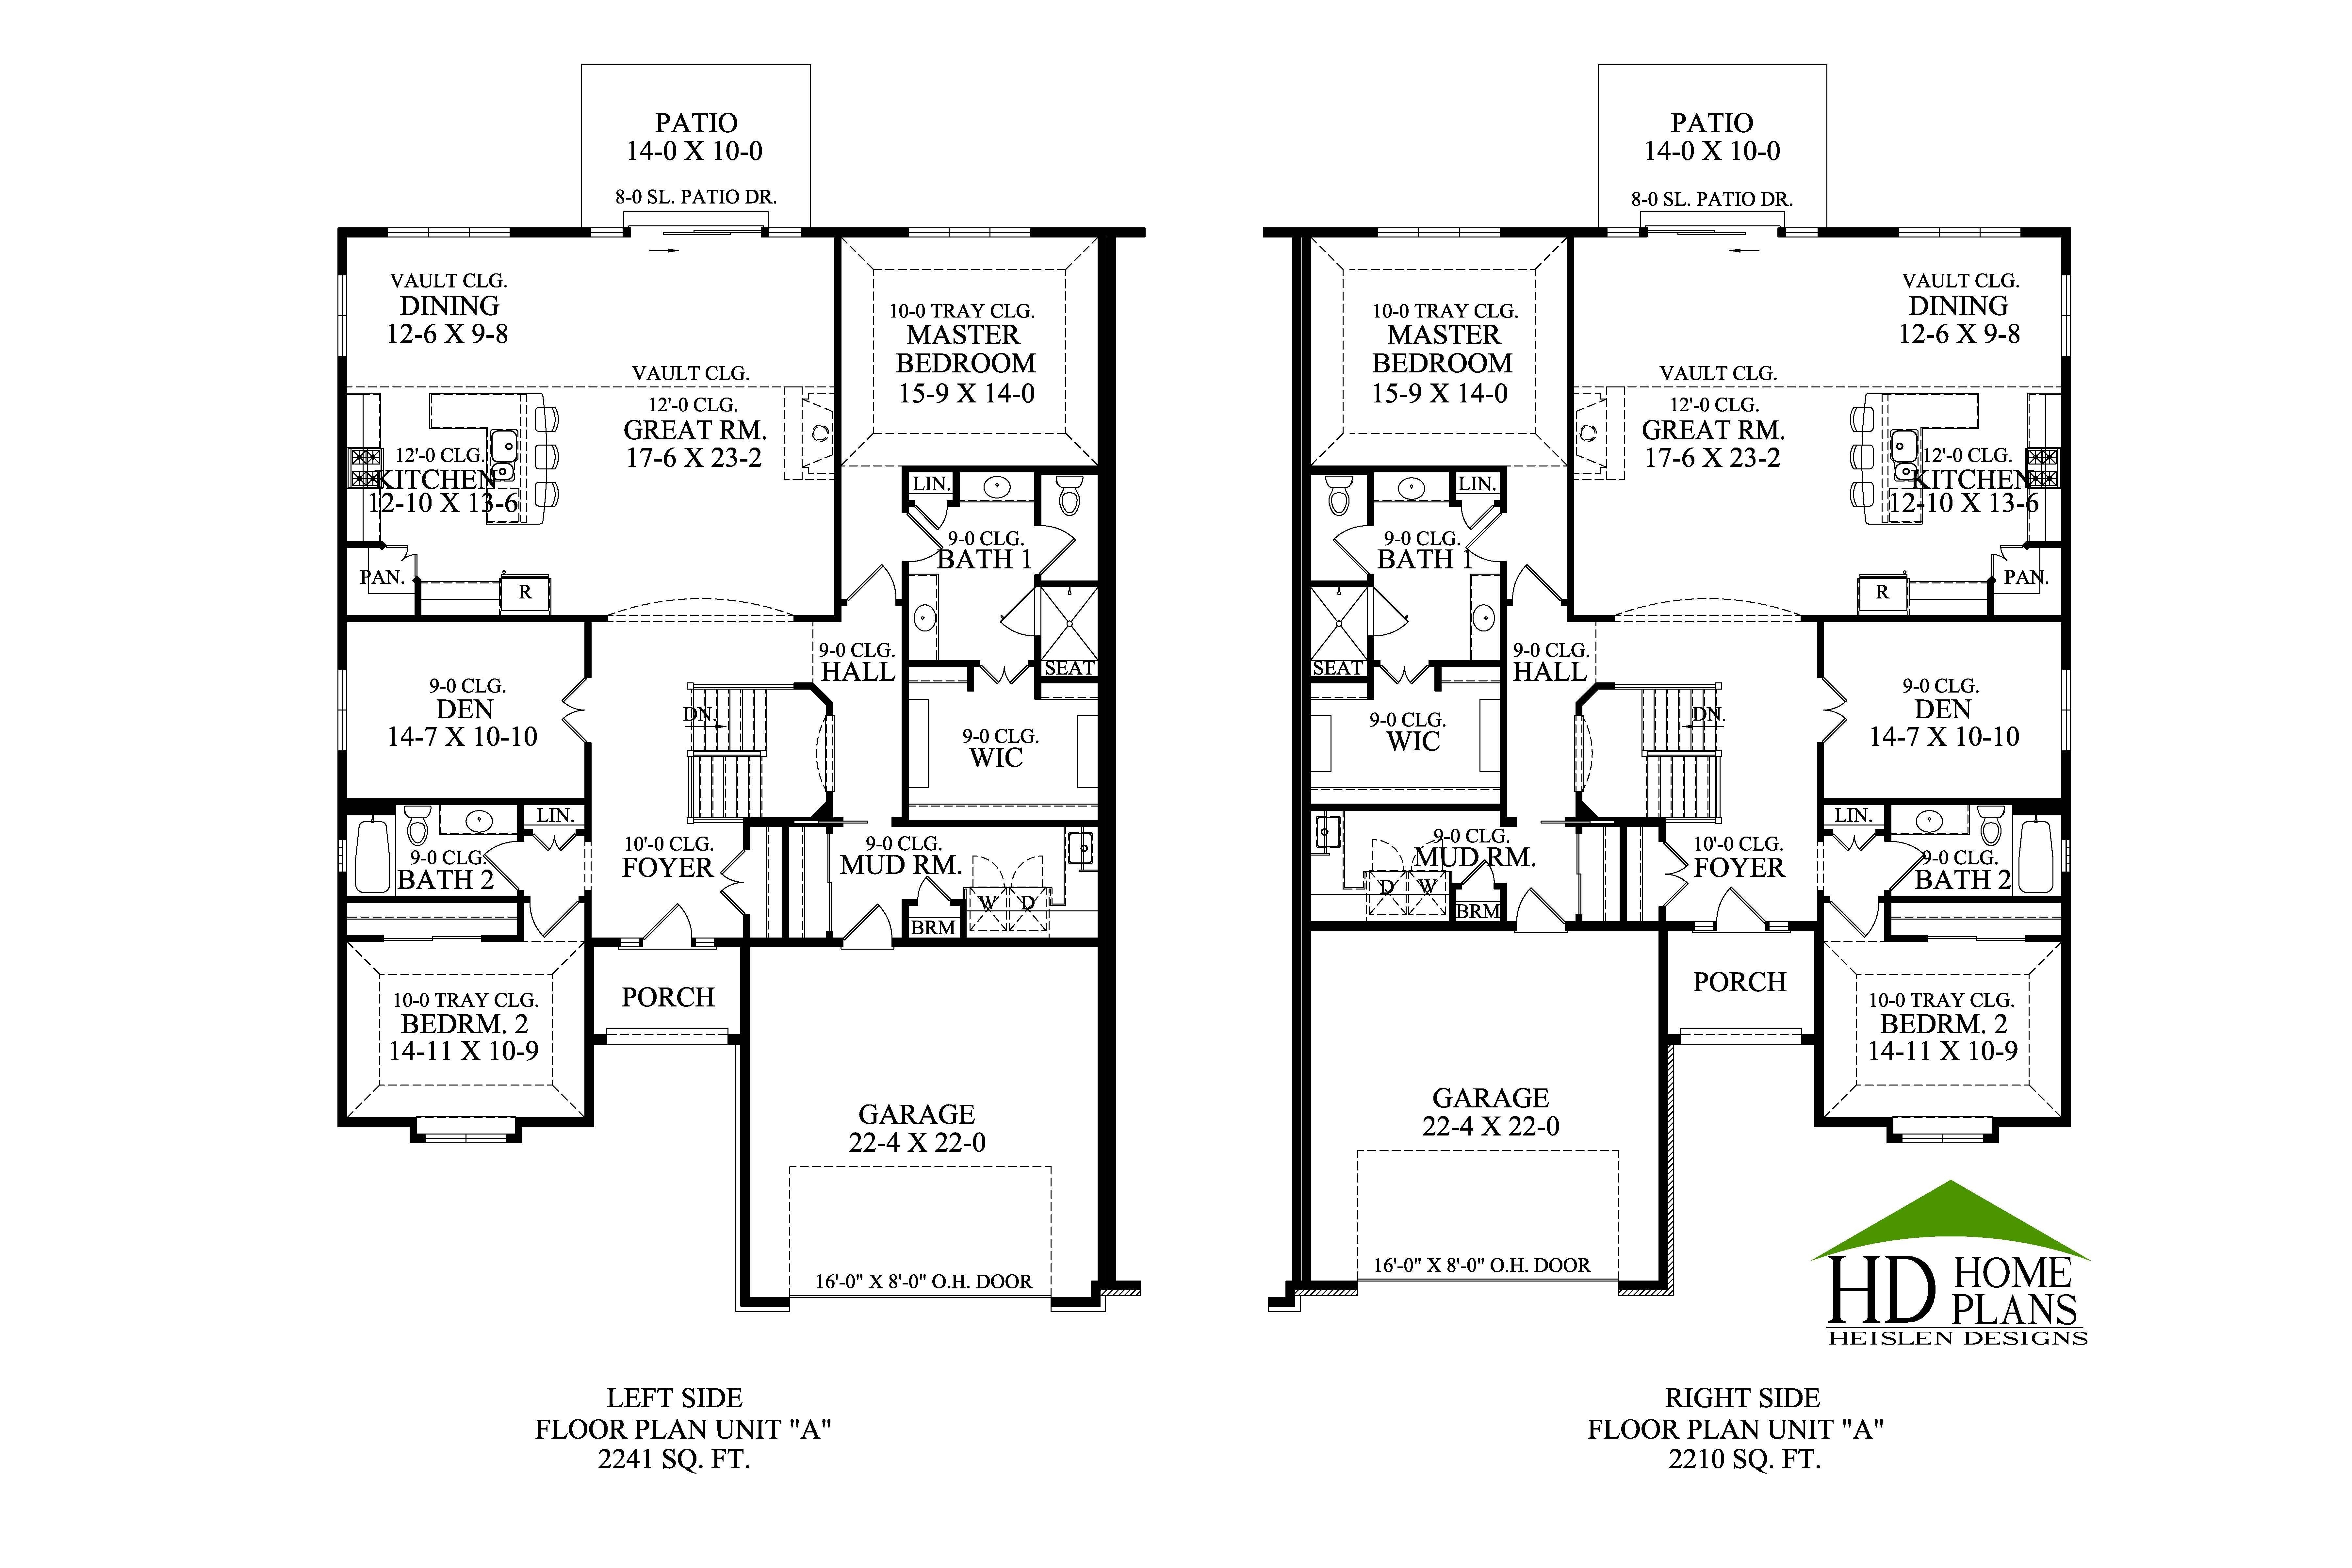 Luxury Making A Floor Plan Check More At Http Www Partnersmetalga Com Making A Floor Plan 5658 Free House Plans House Floor Plans House Plans